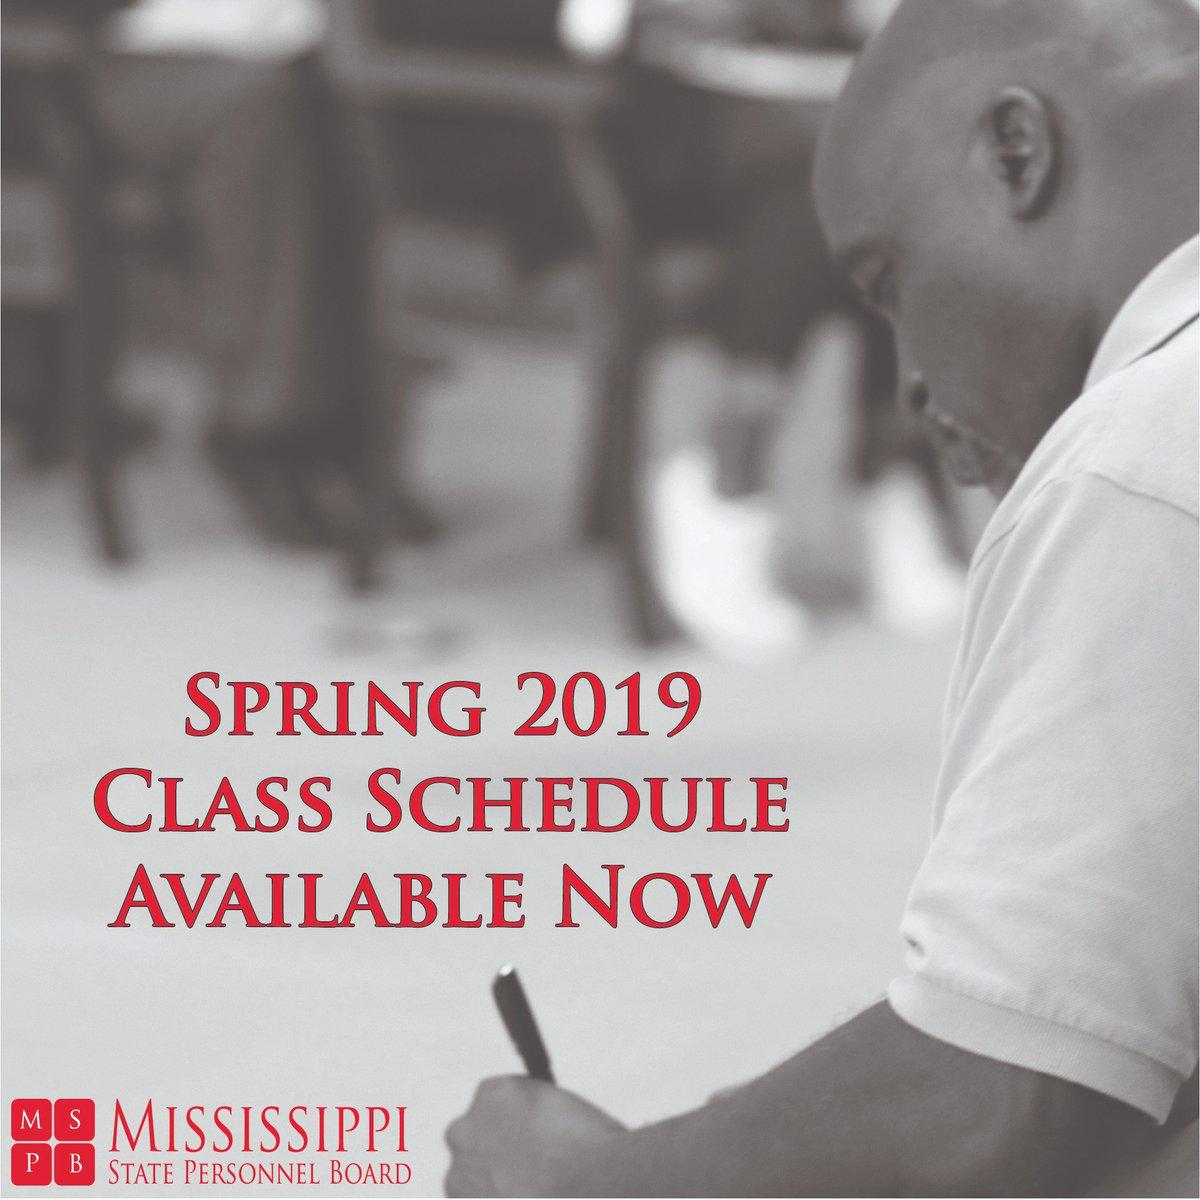 Mississippi State Calendar 2019 Mississippi State Personnel Board on Twitter: